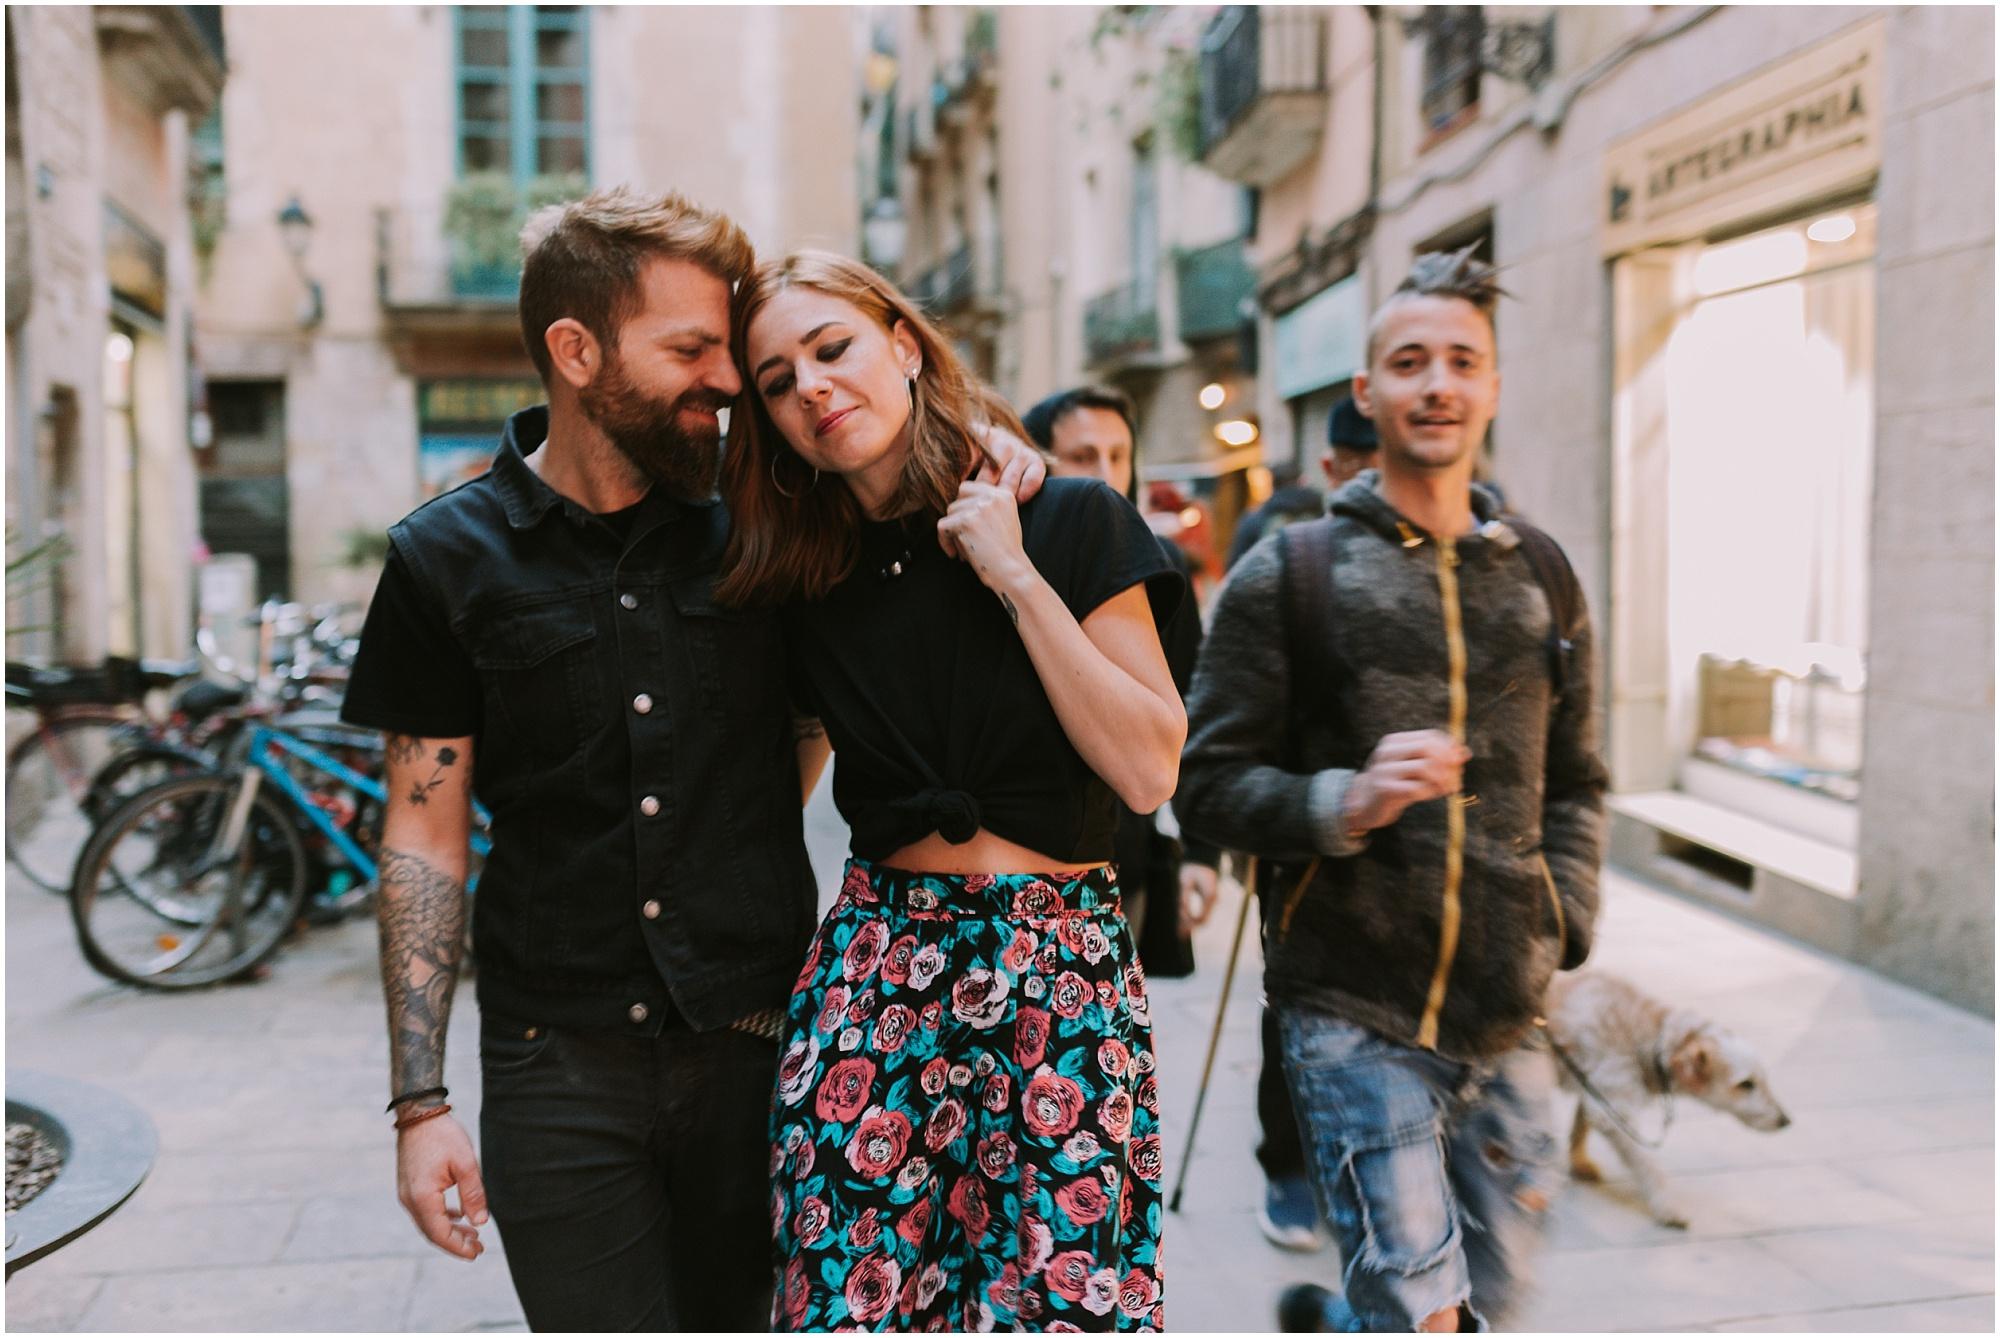 Kateryna-photos-photographer-mariage-boda-love-story-engagement-barcelona_0016.jpg